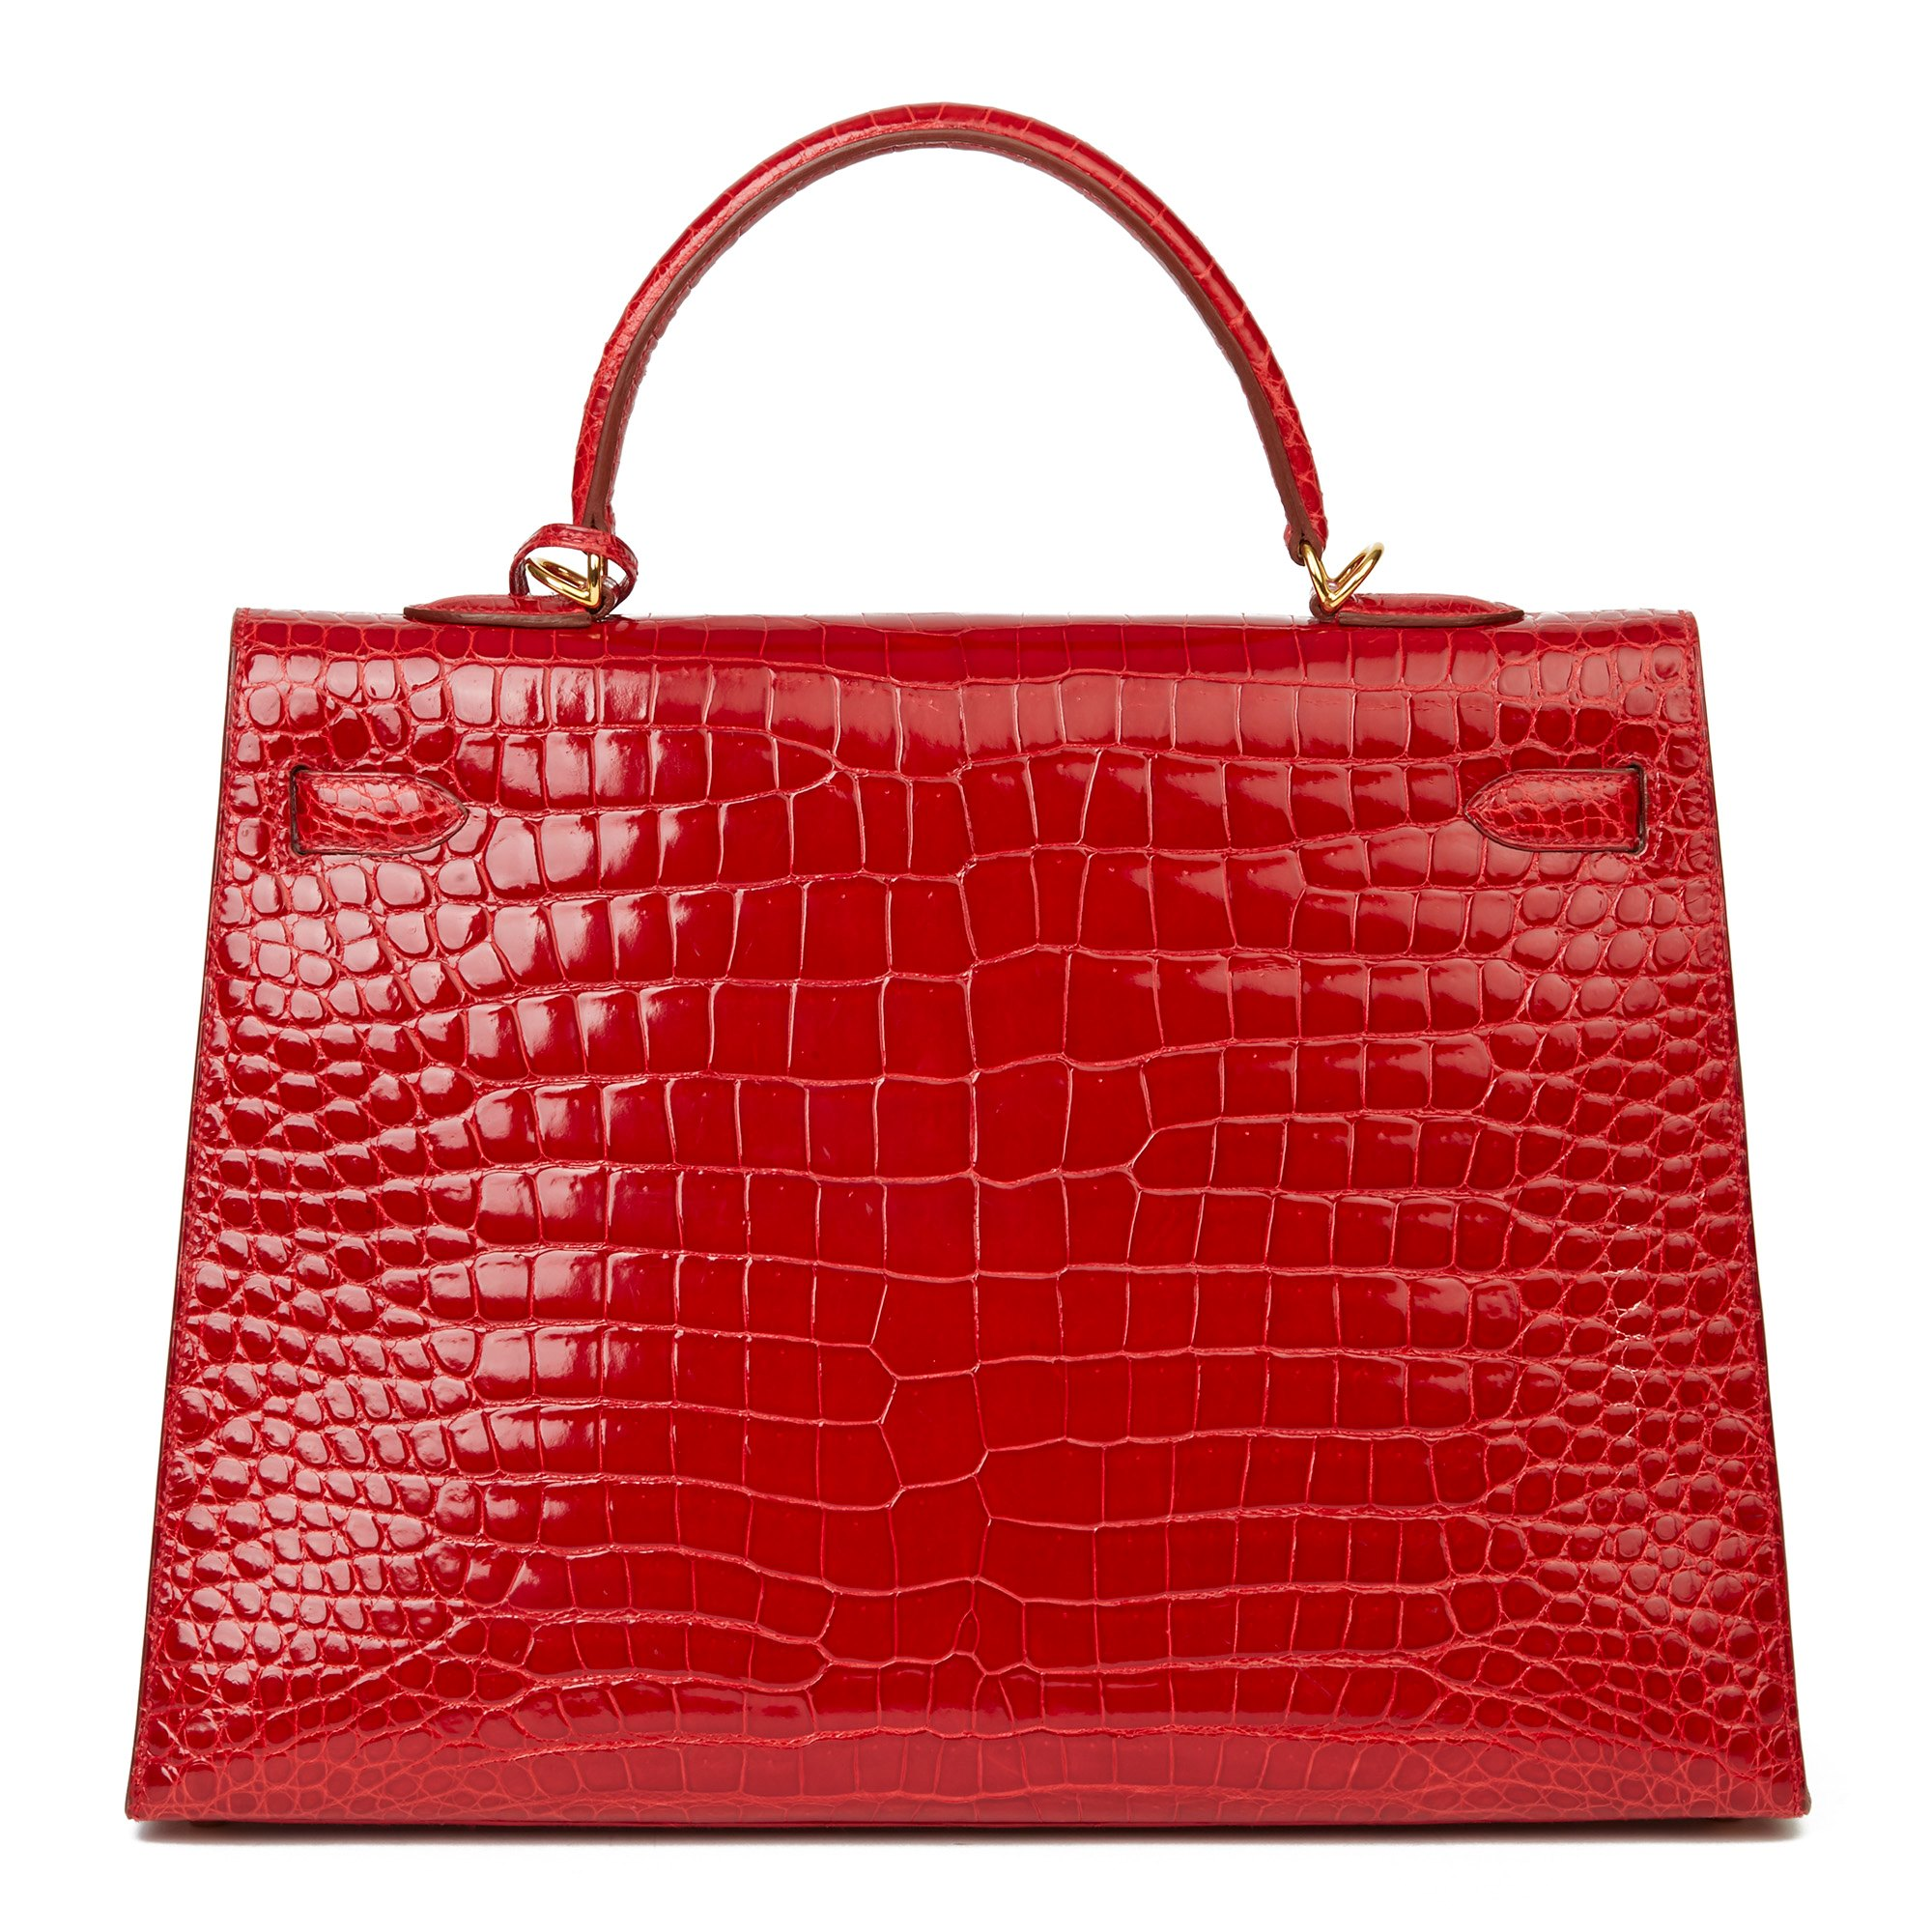 Hermès Braise Shiny Porosus Crocodile Leather Vintage Kelly 35cm Sellier